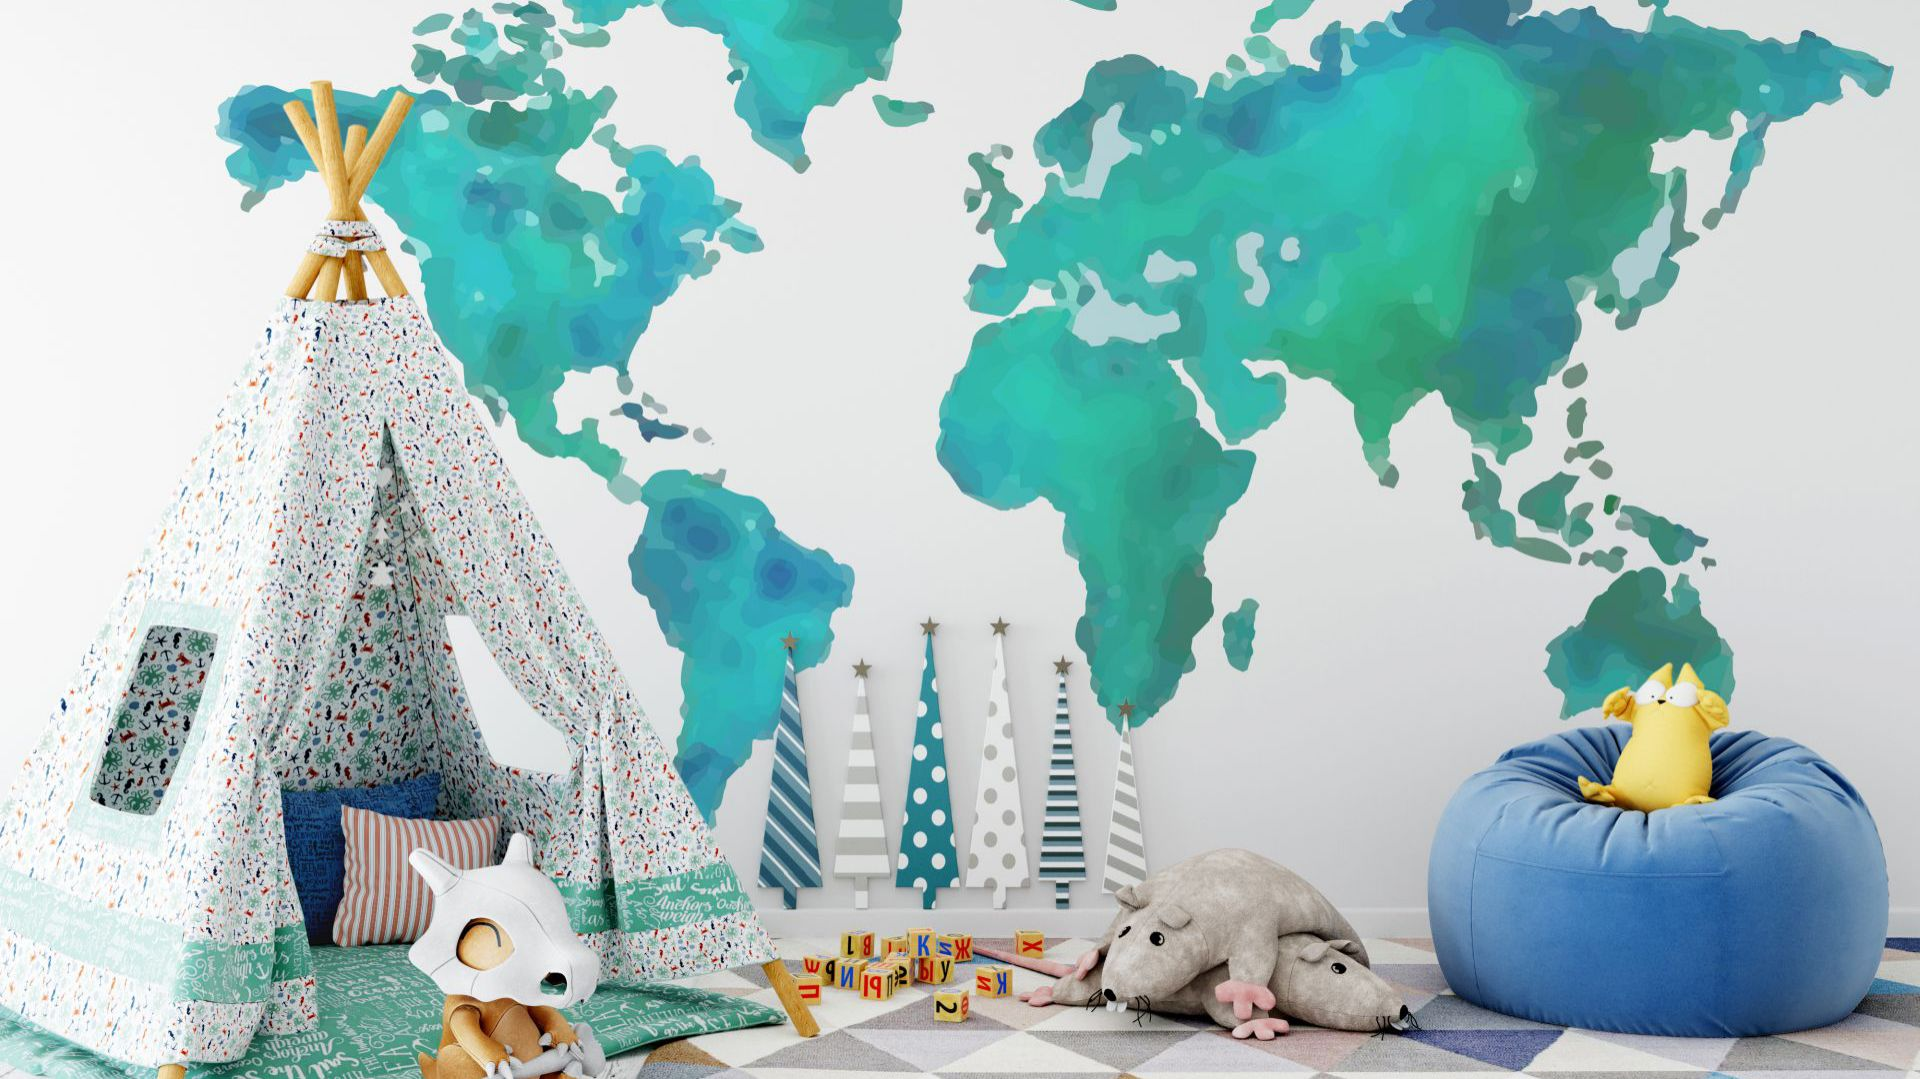 Fototapeta lateksowa Earth. Fot. Fototapeta4u.pl